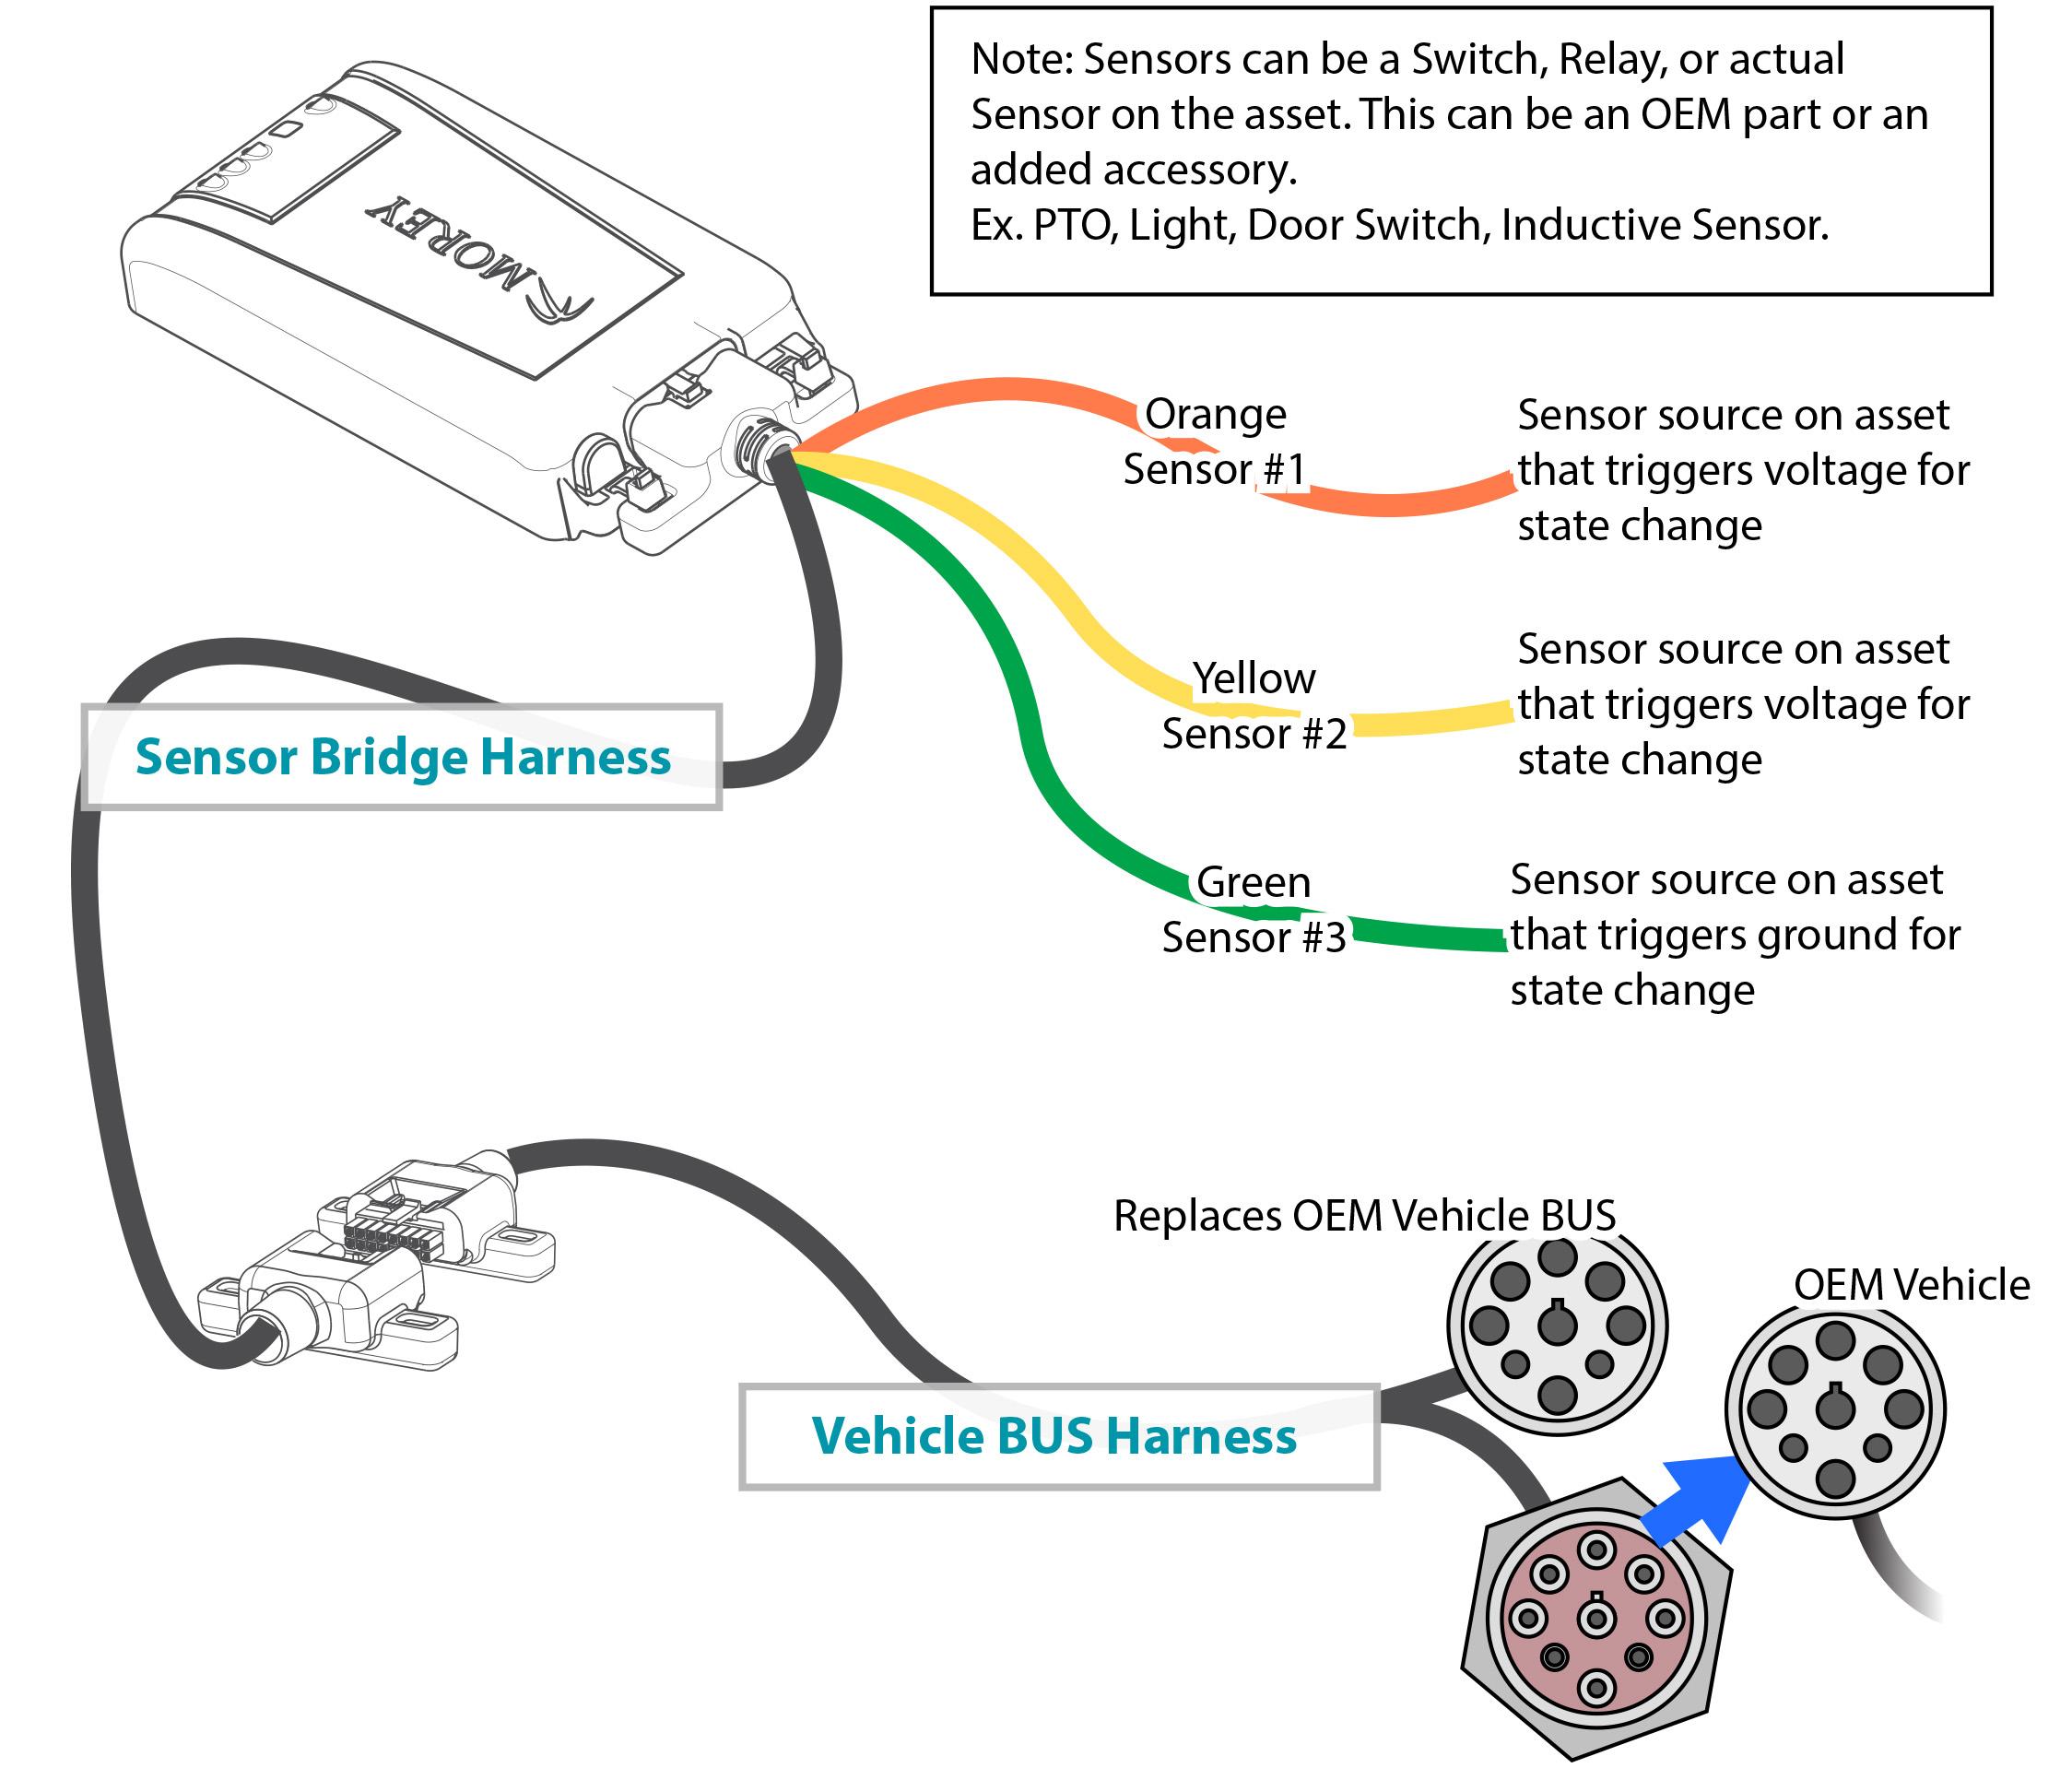 MC Sensor Bridge Harness and Vehicle BUS Harness Configuration